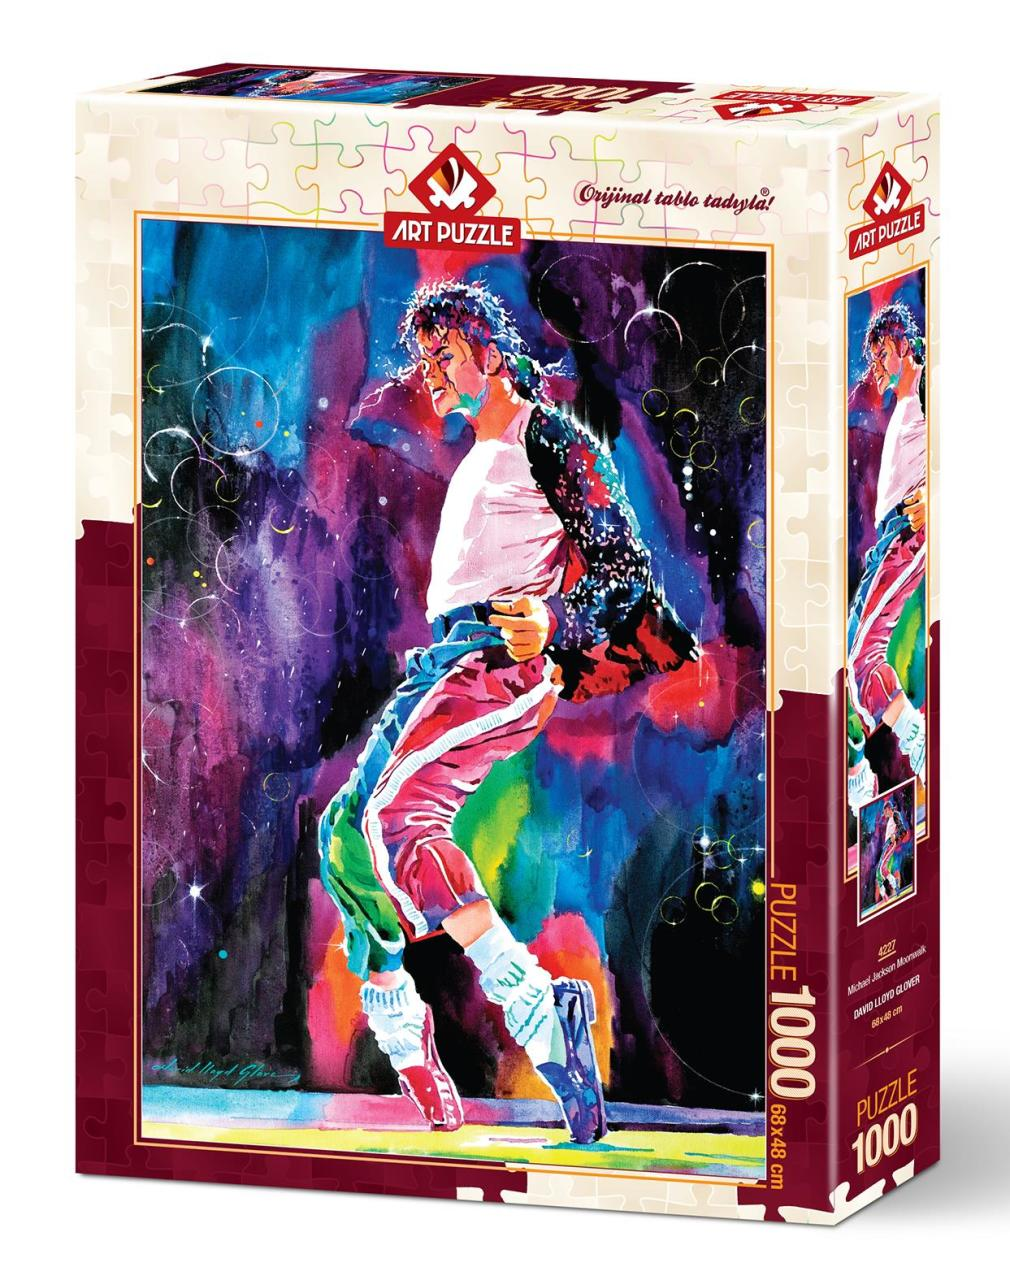 Художественный пазл Майкл Джексон Лунгун, 1000 деталей, пазл